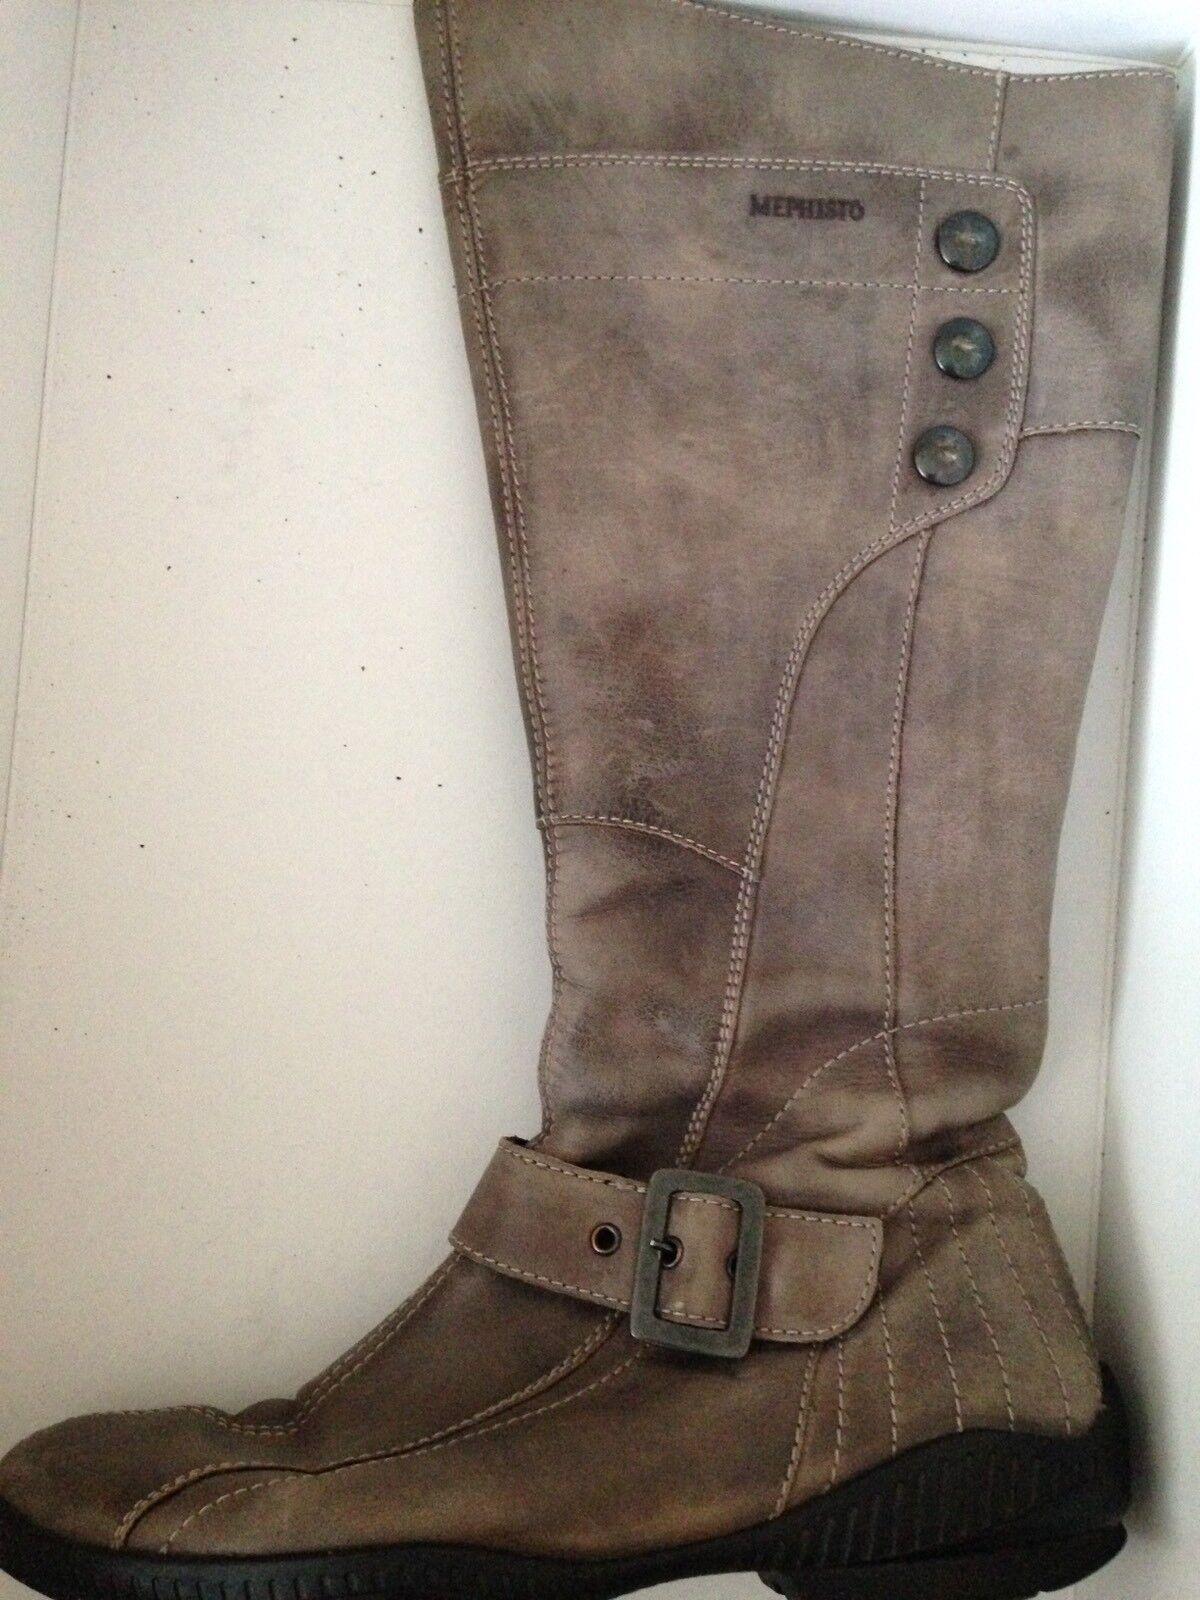 MEPHISTO Gr. 39 US Stiefel 8 1/2 EUR 6 Stiefel US Reissverschluss Sarah 9365 12b1f9